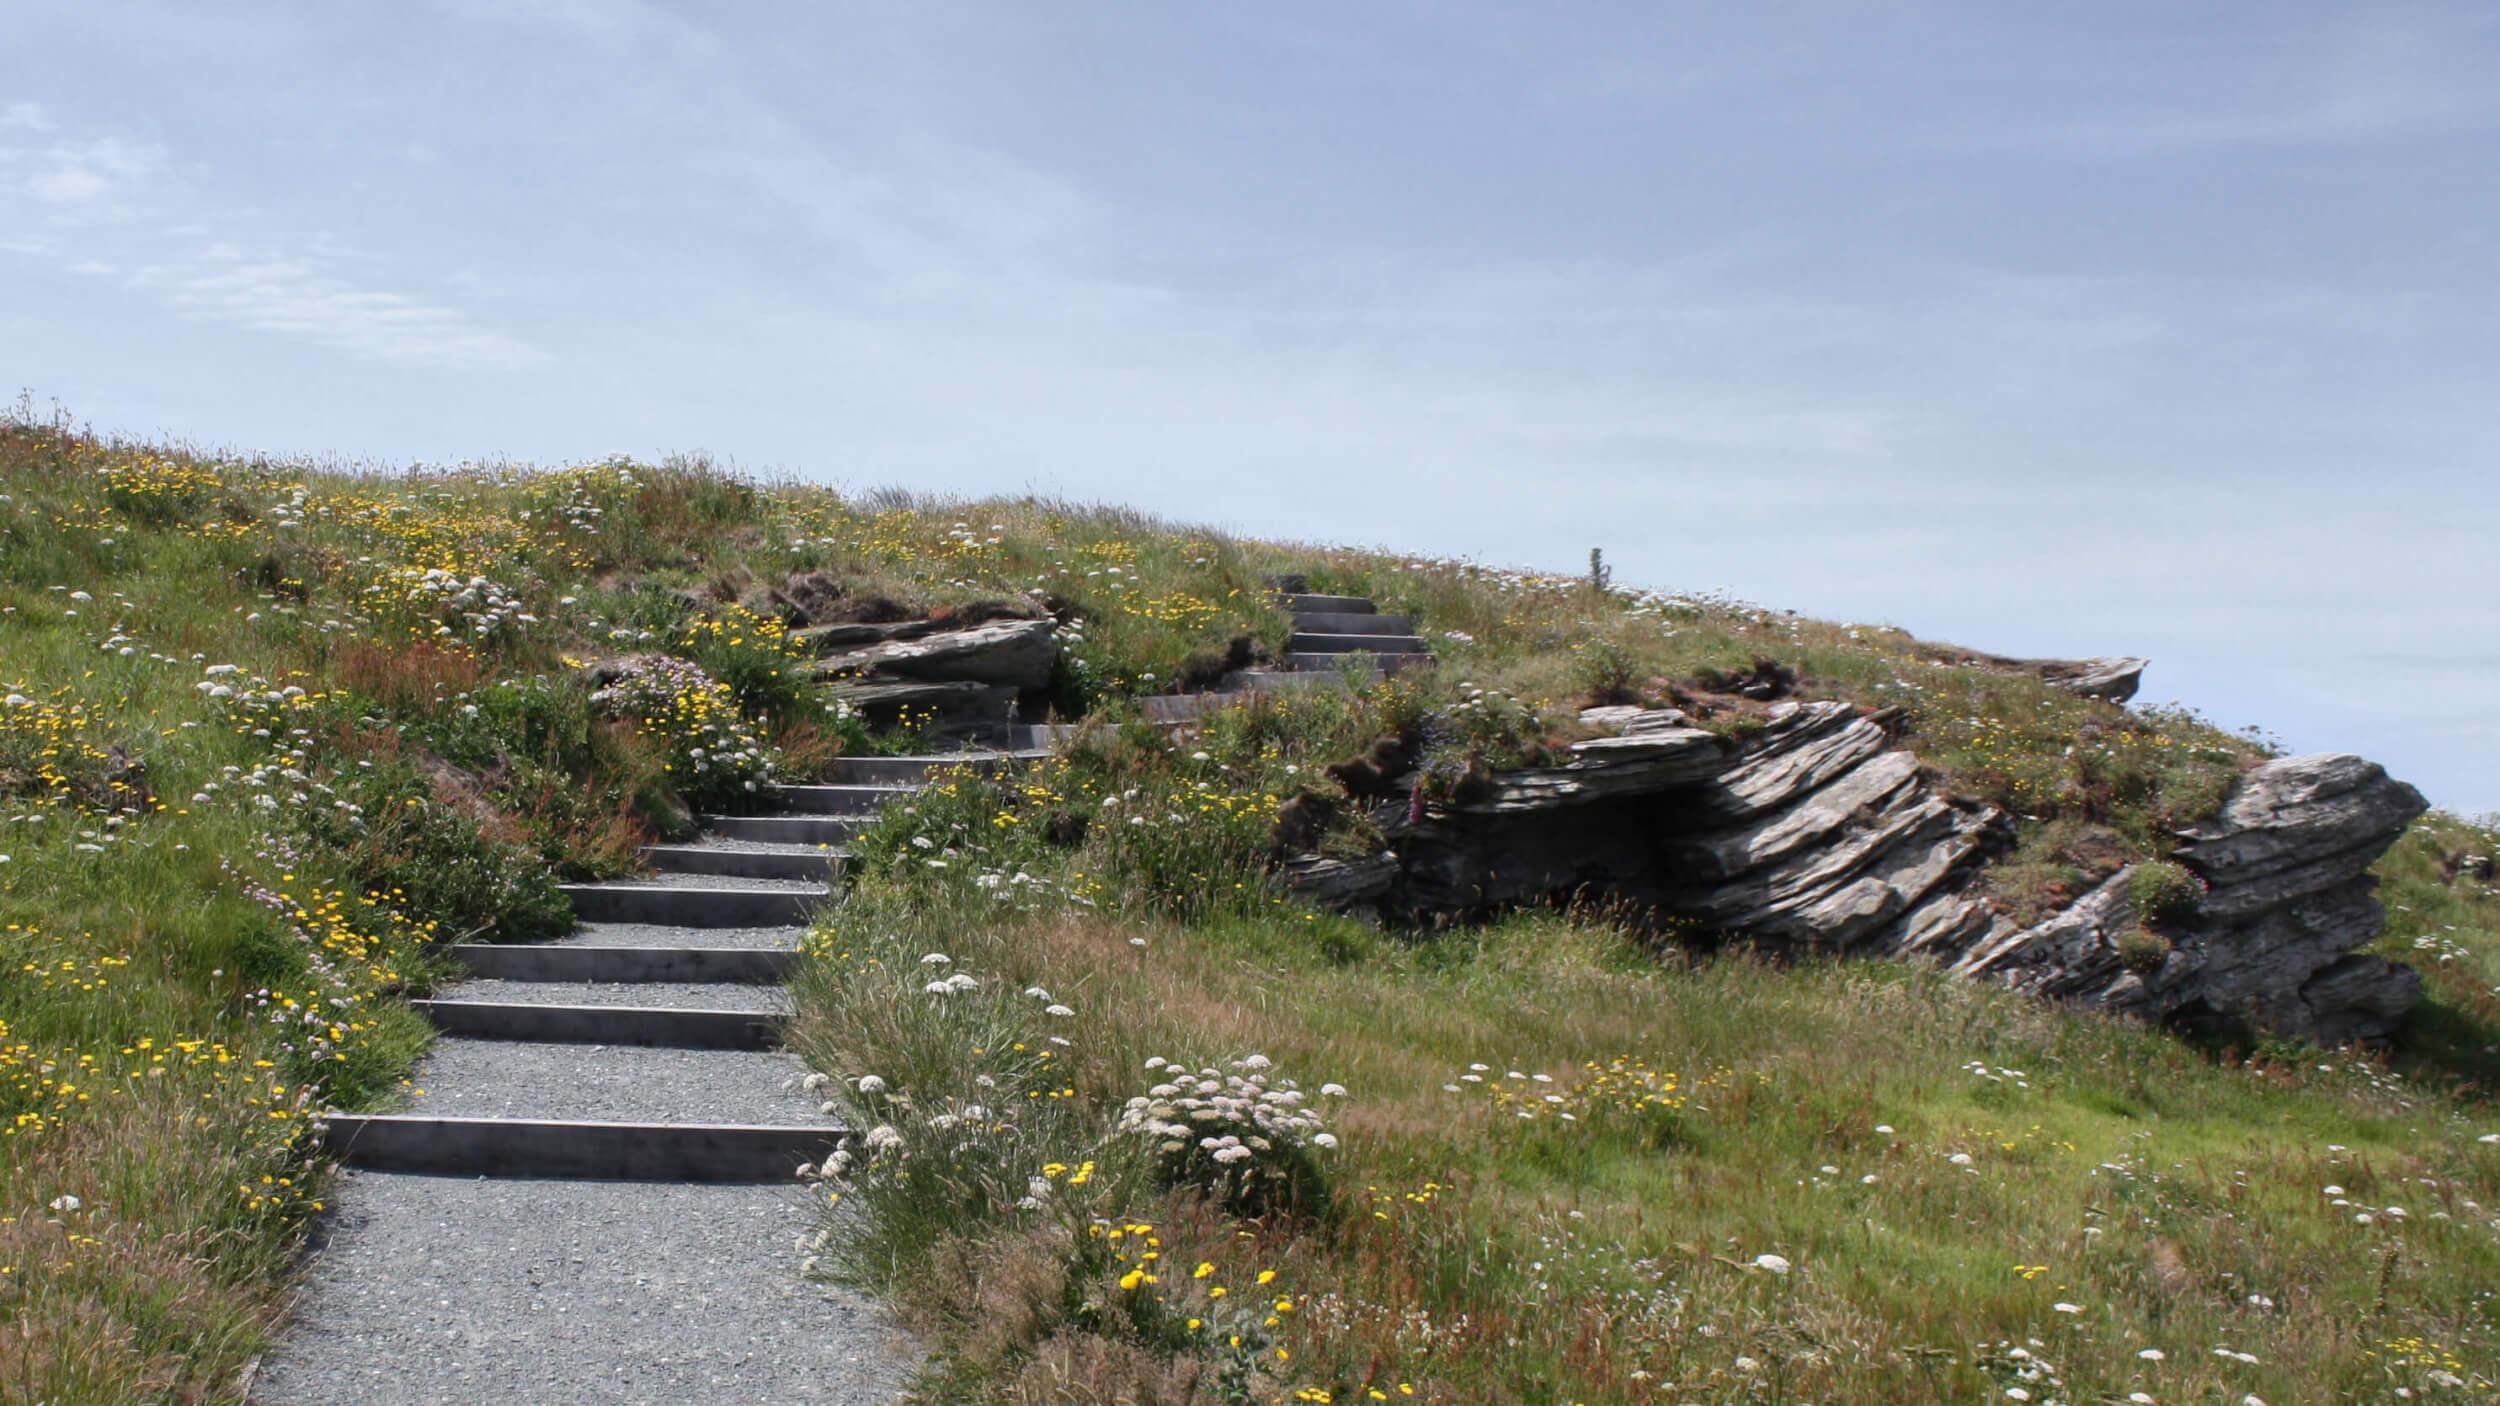 Tintagel Footpaths (As built)